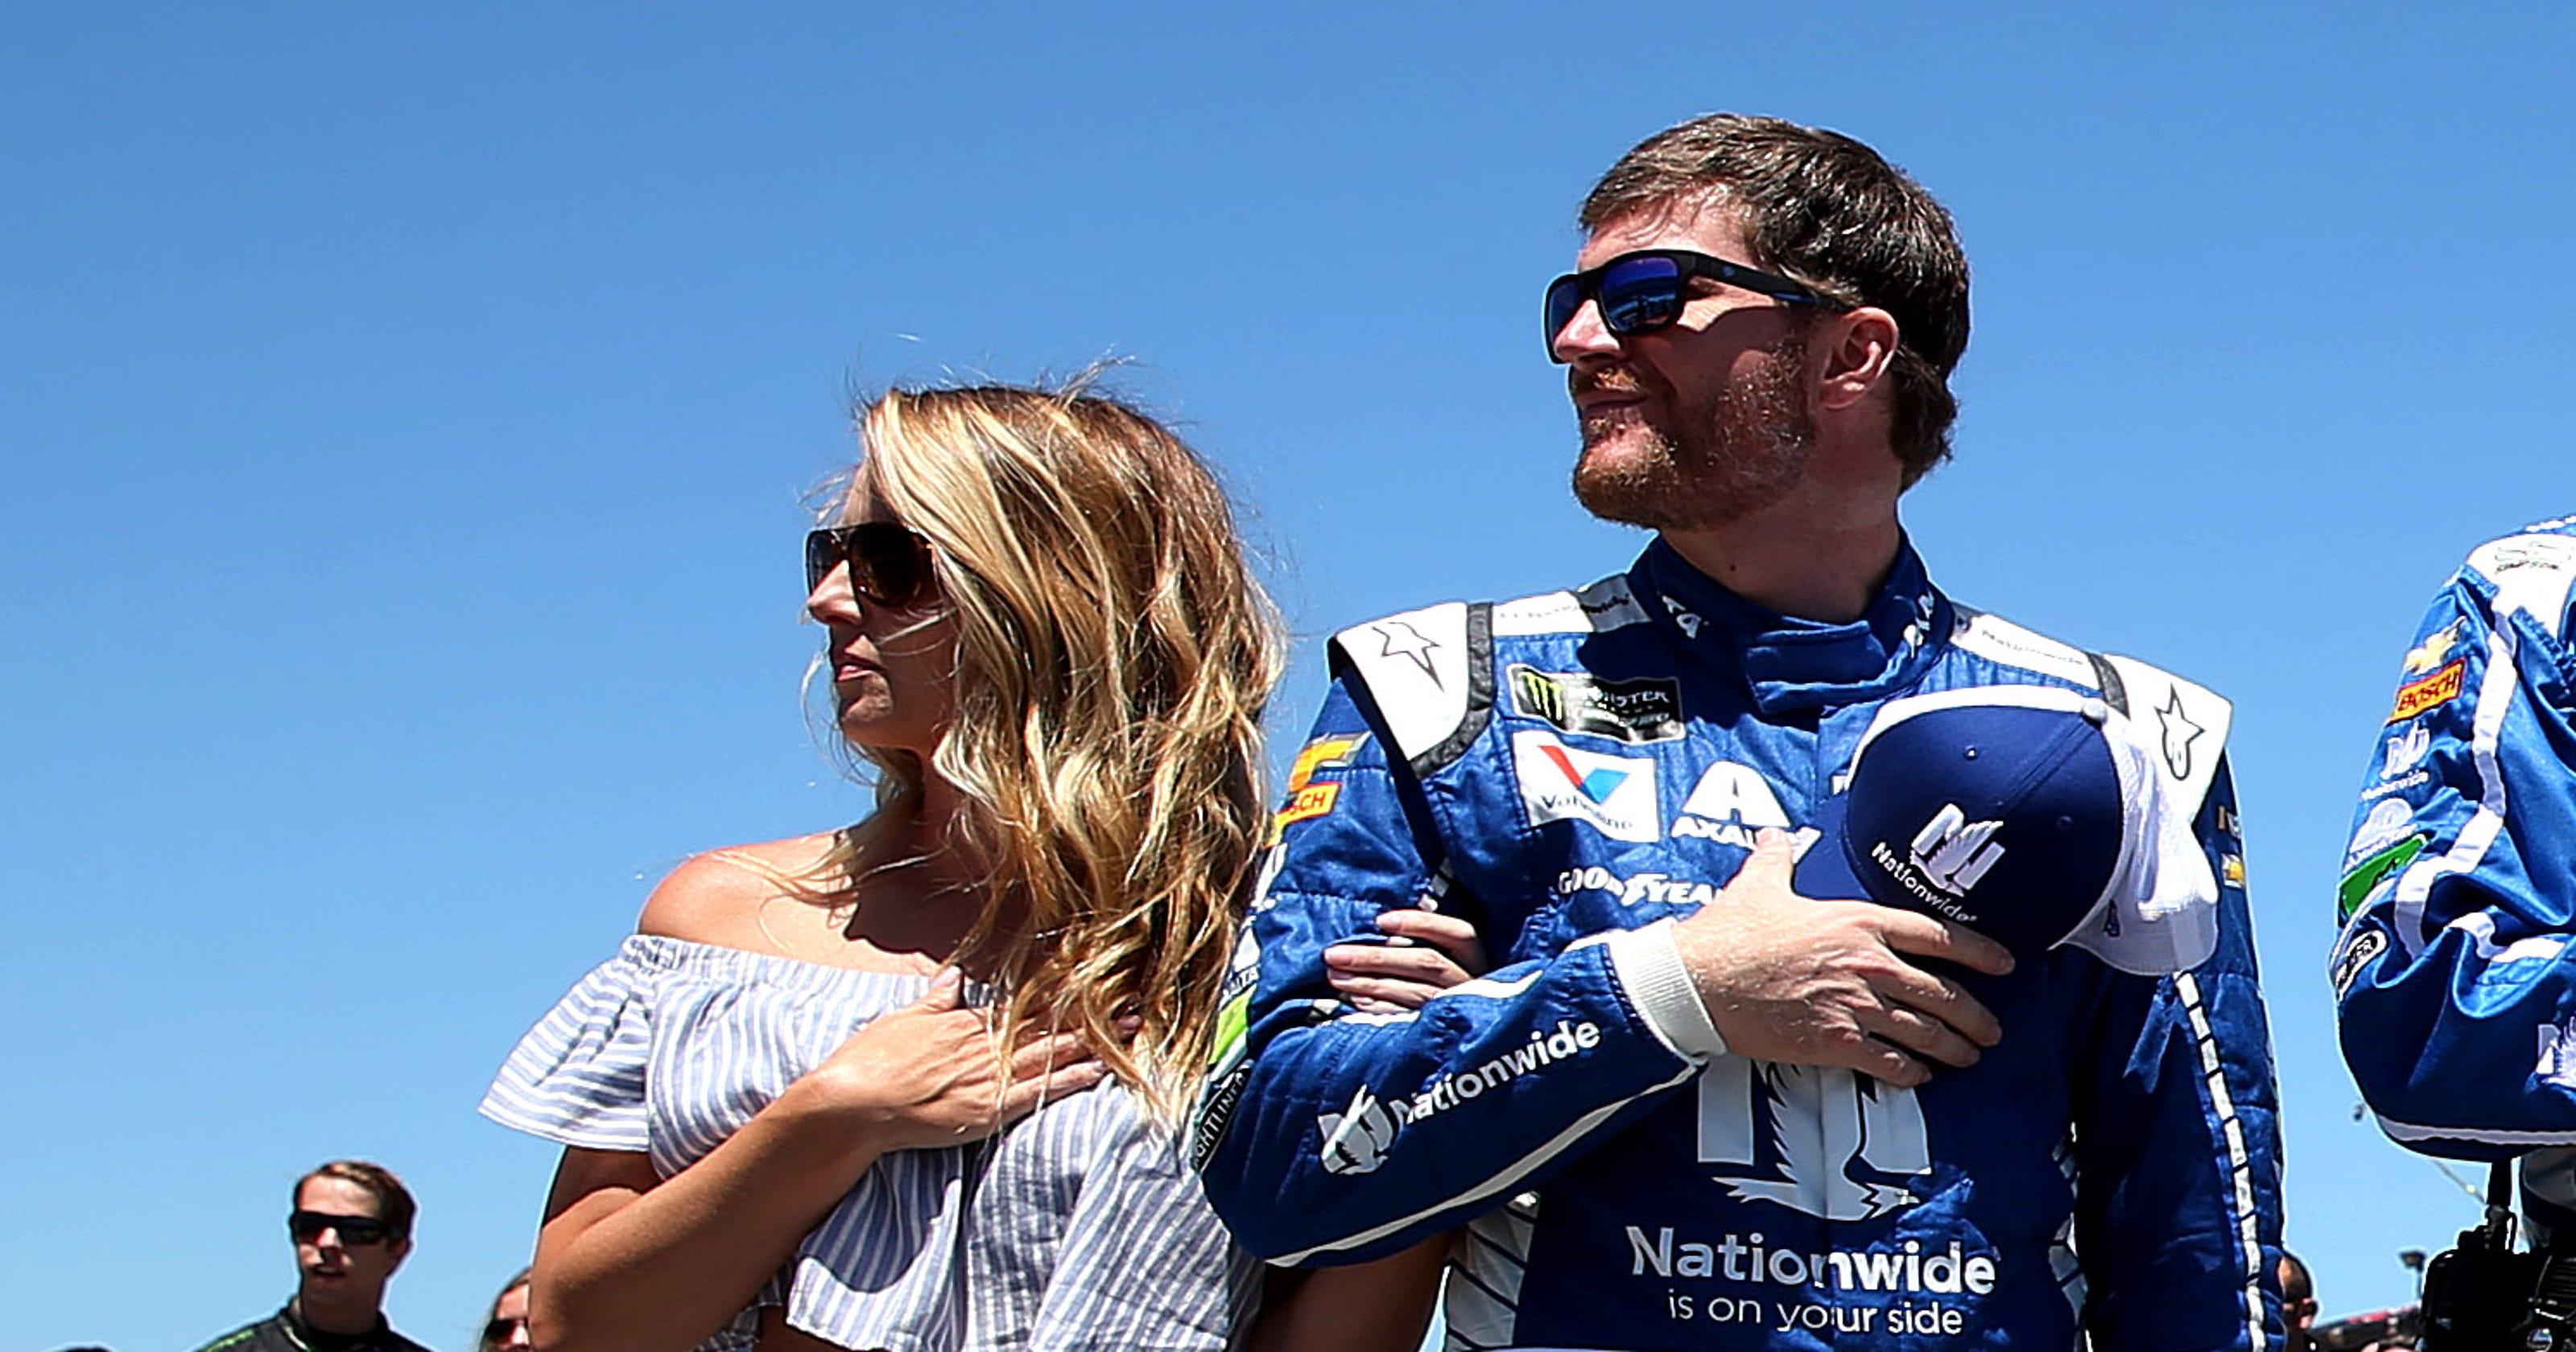 Dale Earnhardt Jr Wedding.Nascar Star Dale Earnhardt Jr Wife Expecting Their First Child